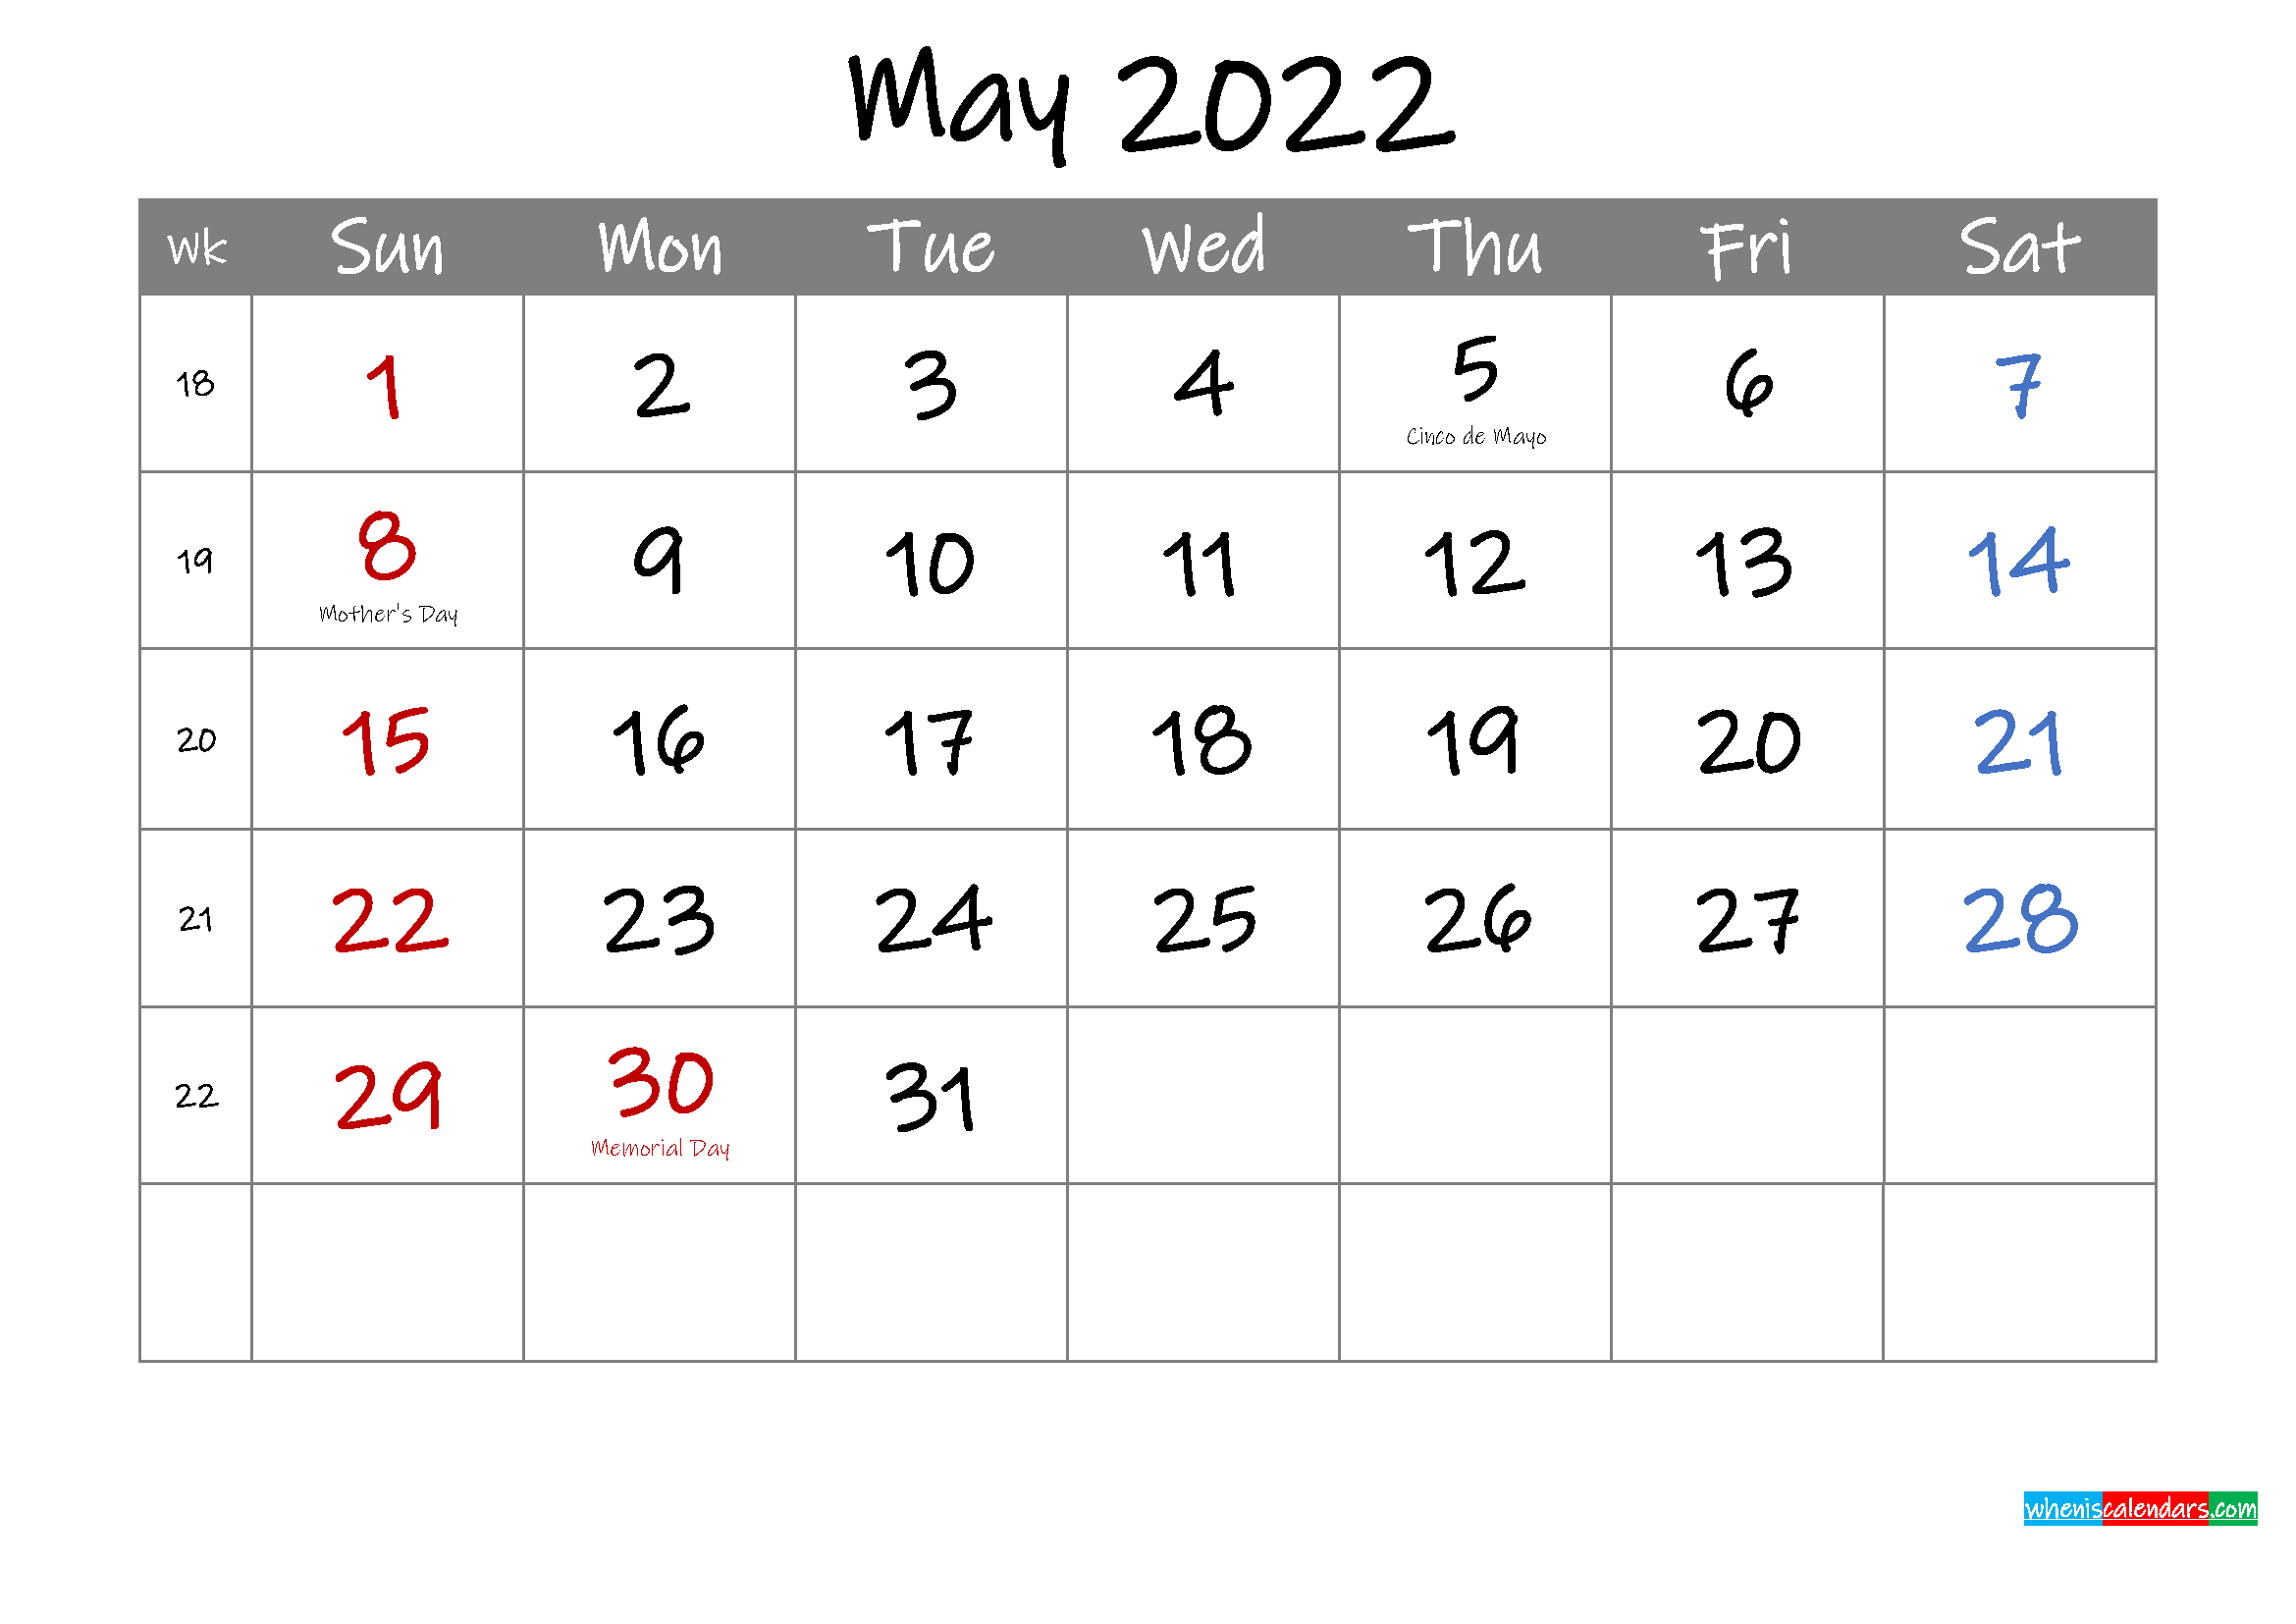 Editable May 2022 Calendar with Holidays - Template ...